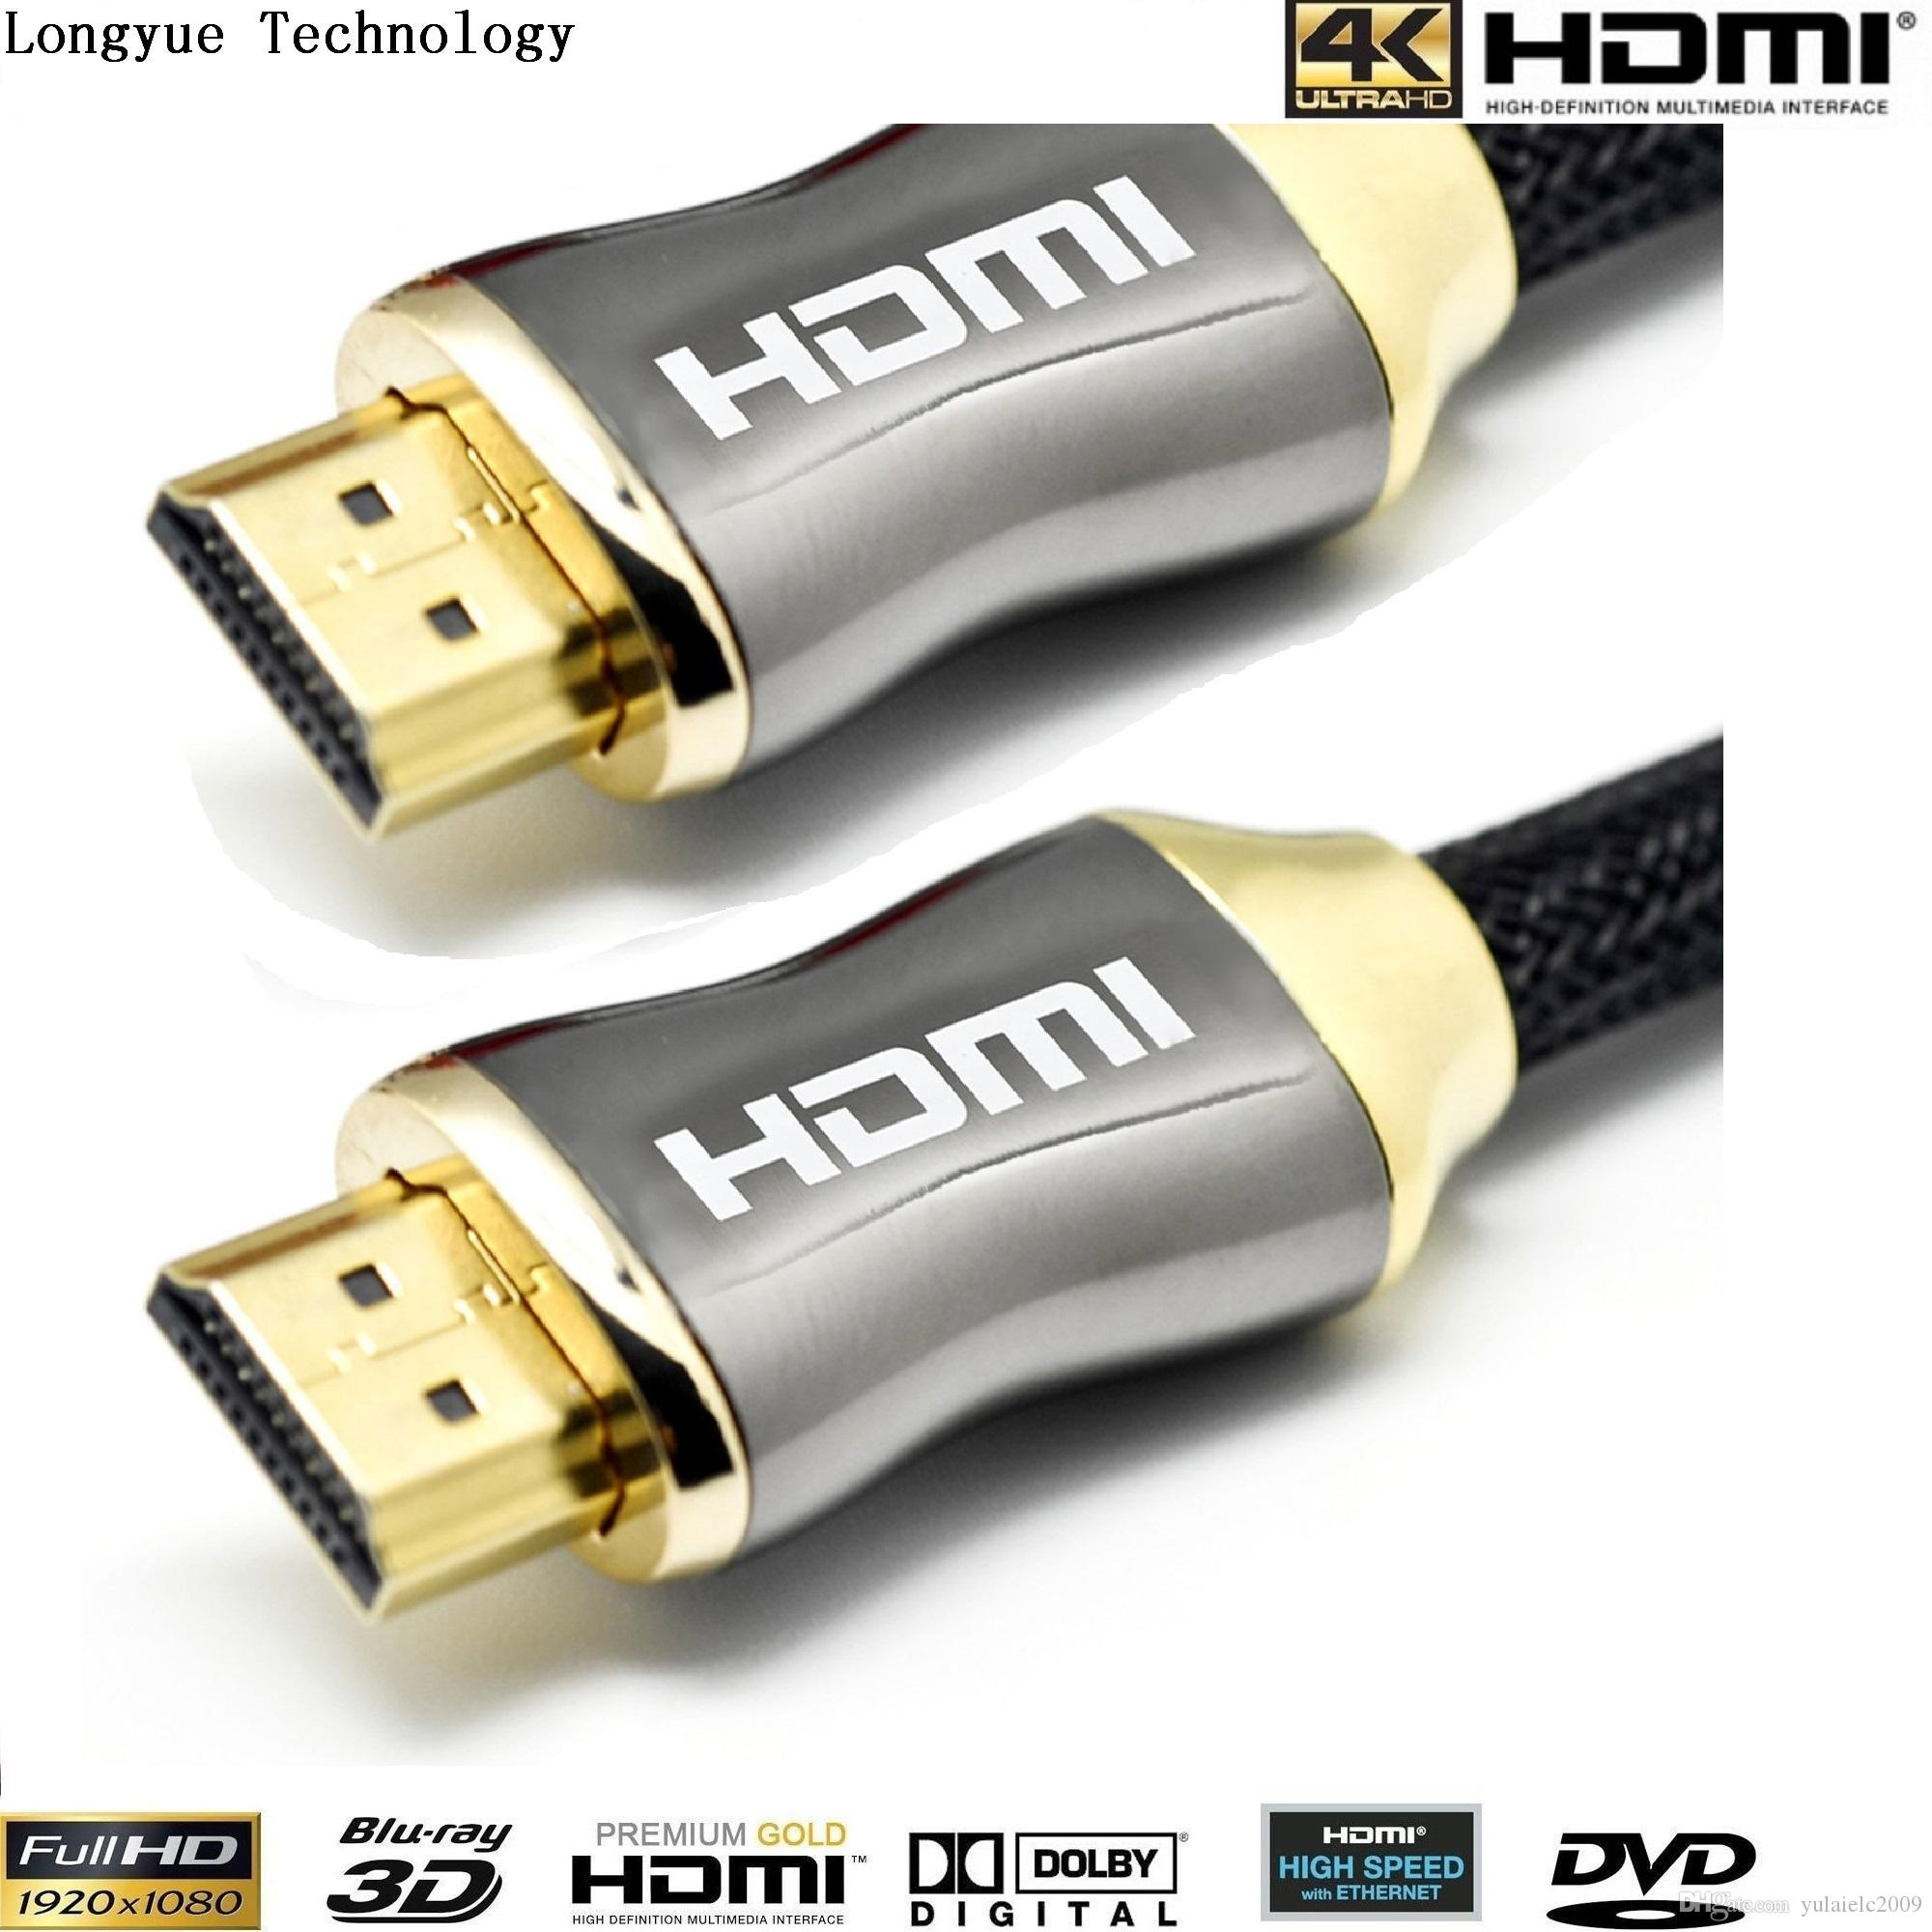 0.5m 1m 2m 3m 5m 7.5m 10m 20m 2ft/3ft/5ft/6ft/10ft GOLD metal casew HDMI 1.4V PREMIUM hdmi Cable HDTV 3D 1080P 2160P Lead metre